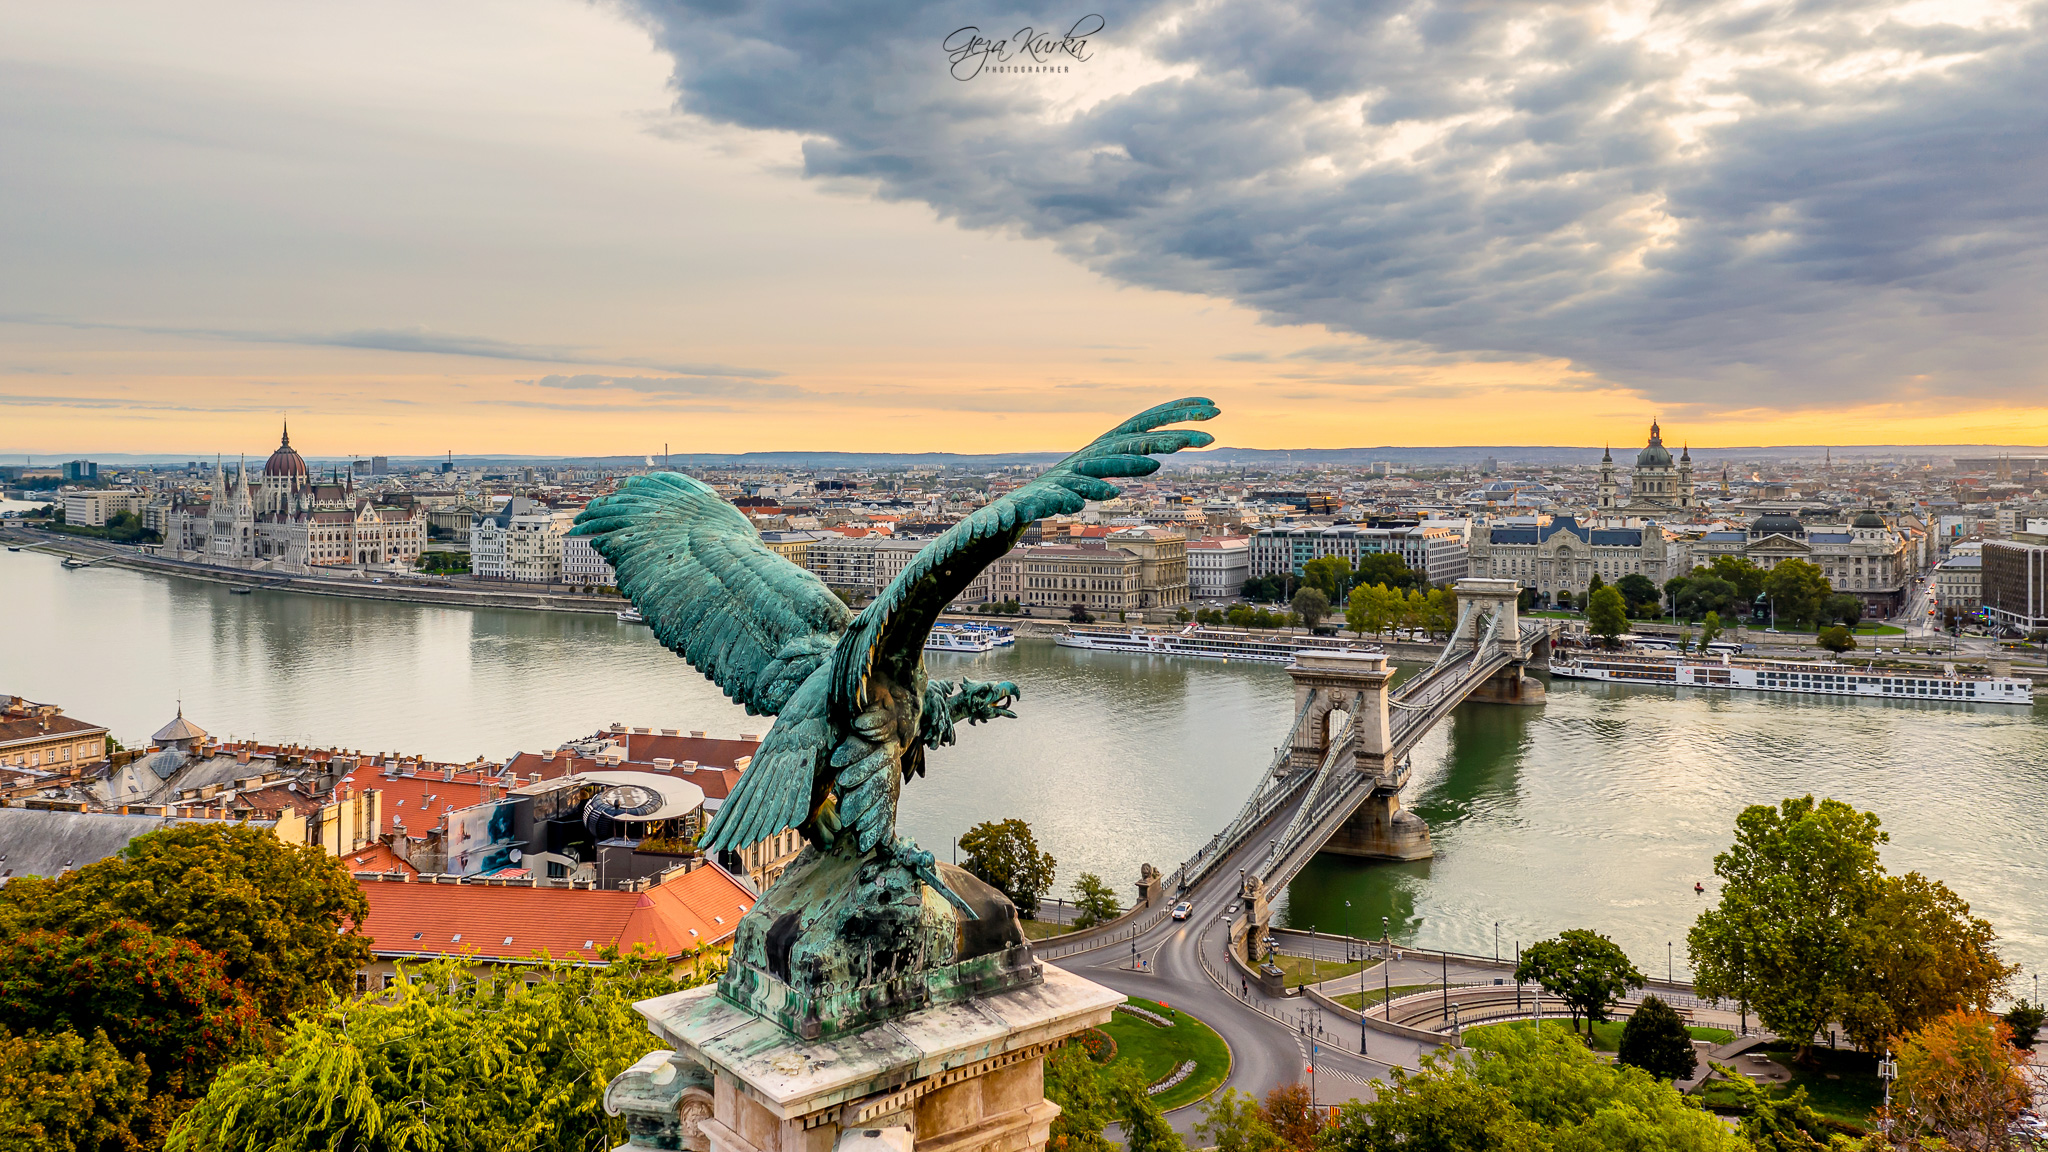 Budapest cityscape with turul bird., Hungary